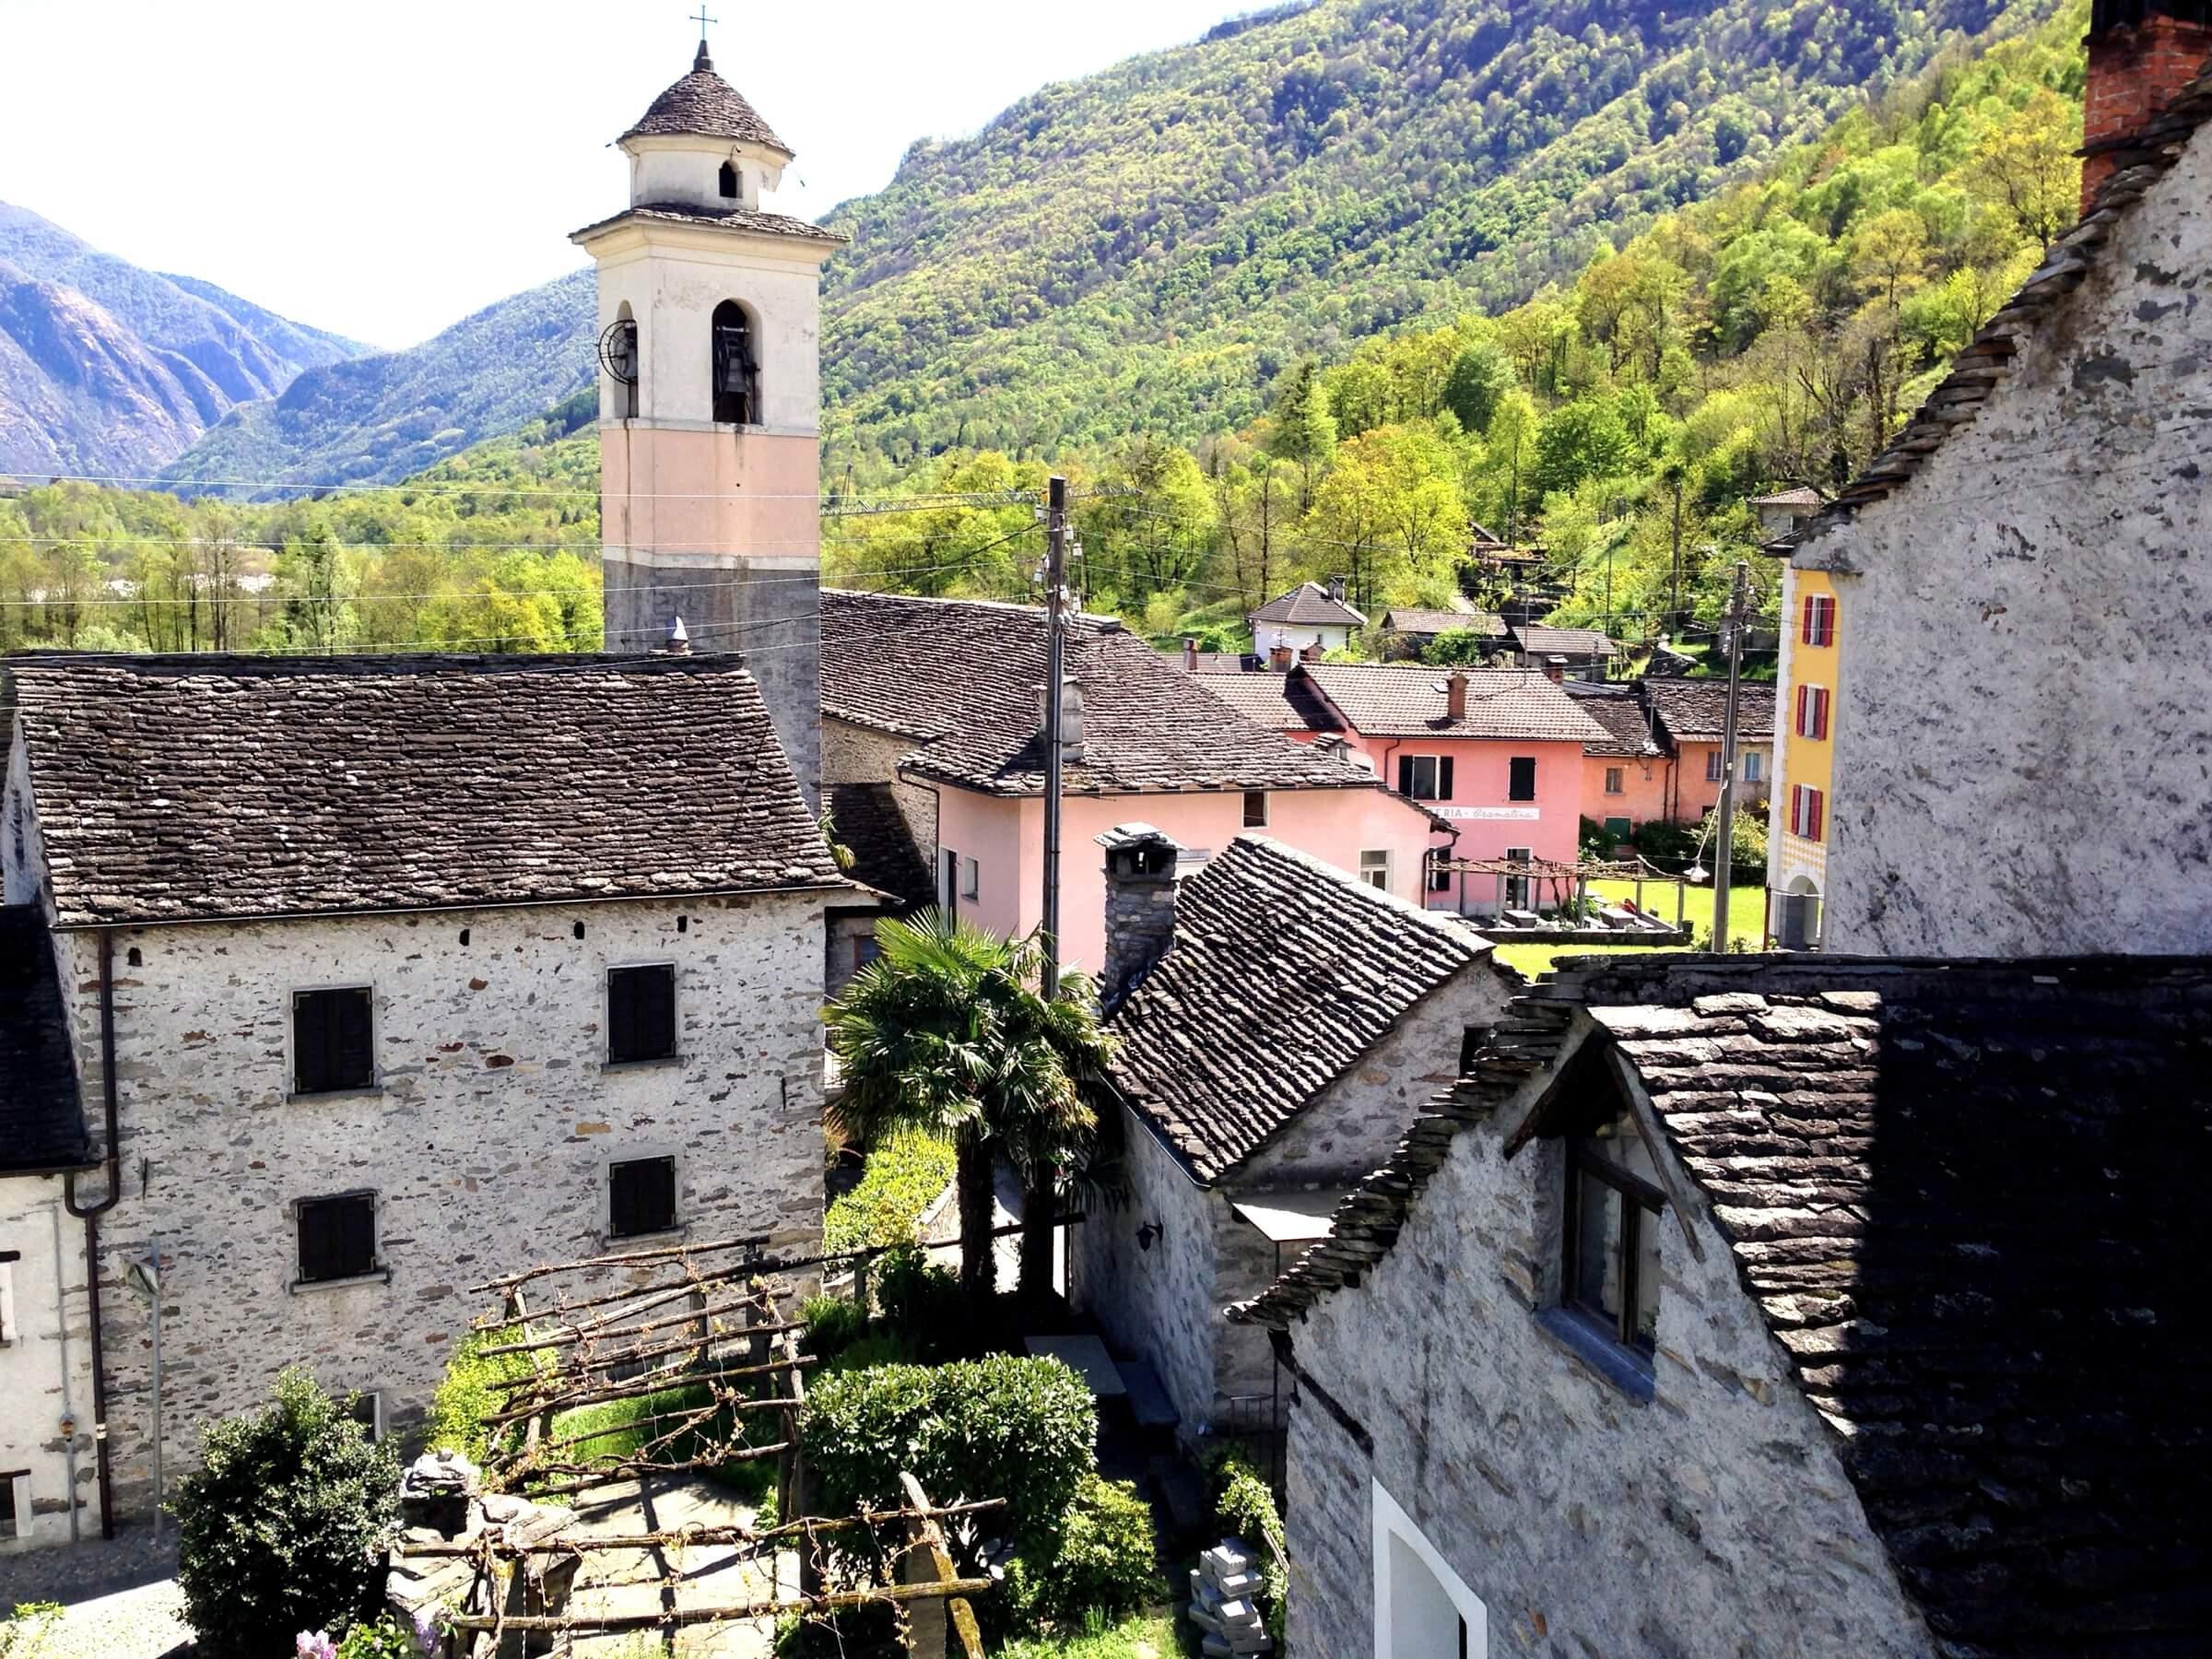 Italian lifestyle meets Switzerland in the Canton of Ticino.